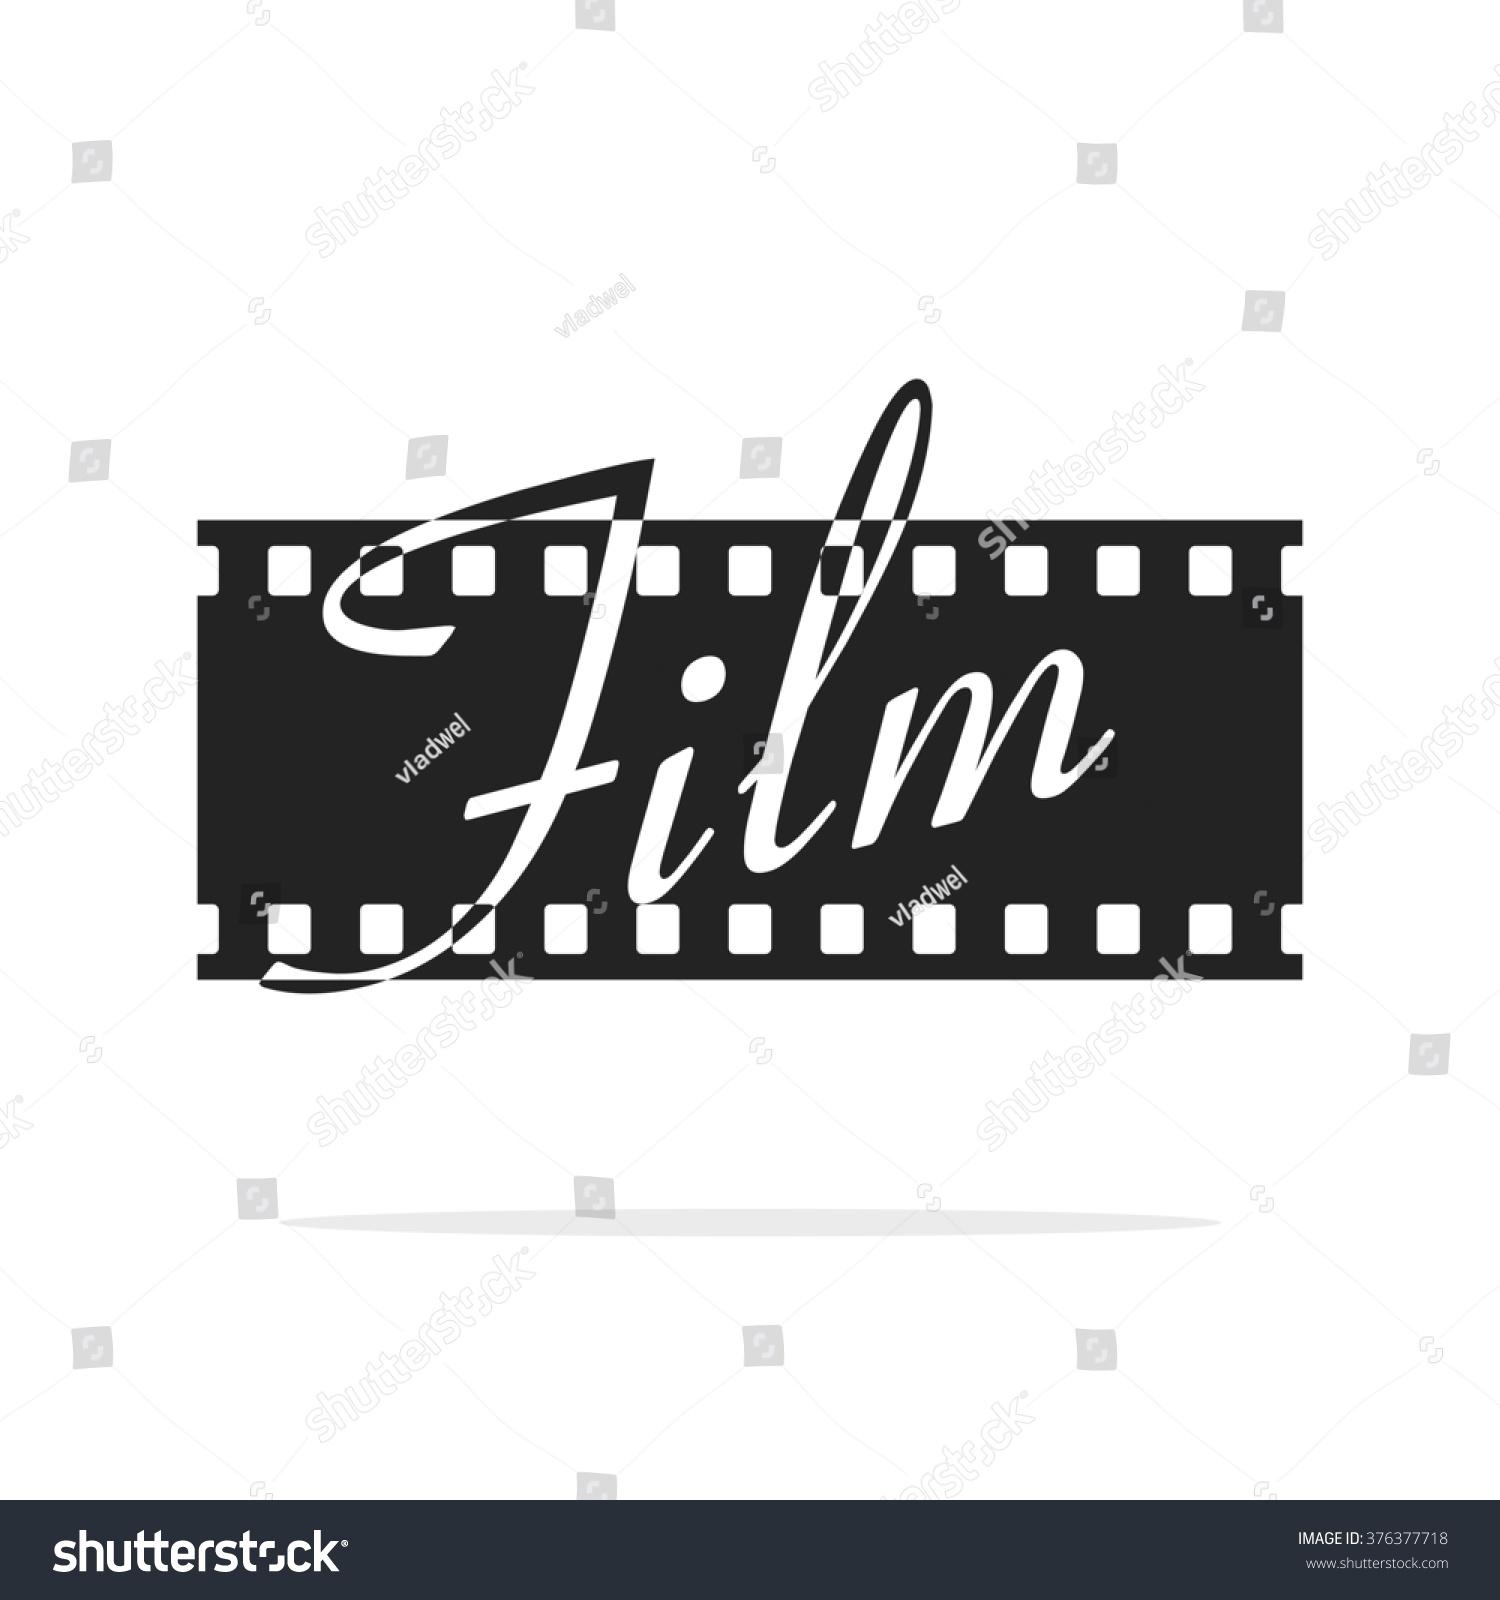 Camera film strip logo film text stock illustration for Camera film logo